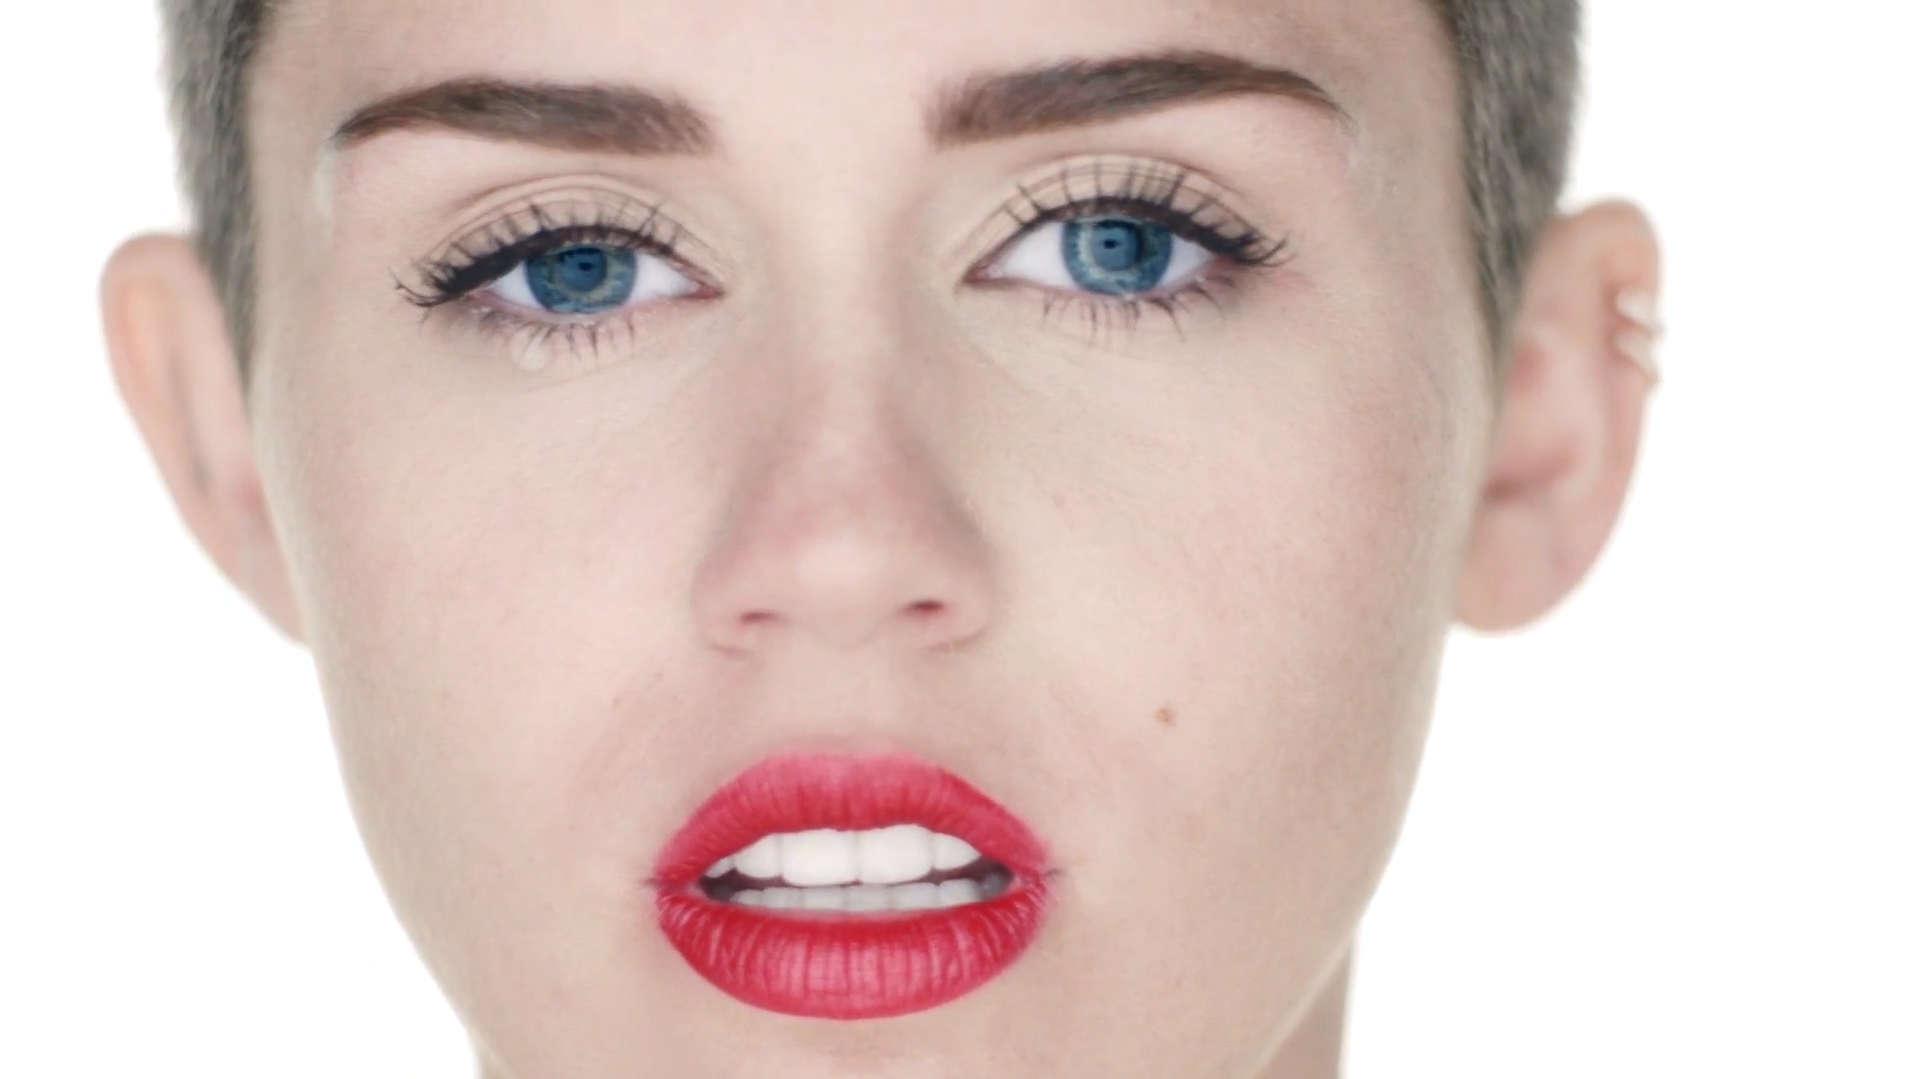 image Miley cyrus wrecking ball xxx version